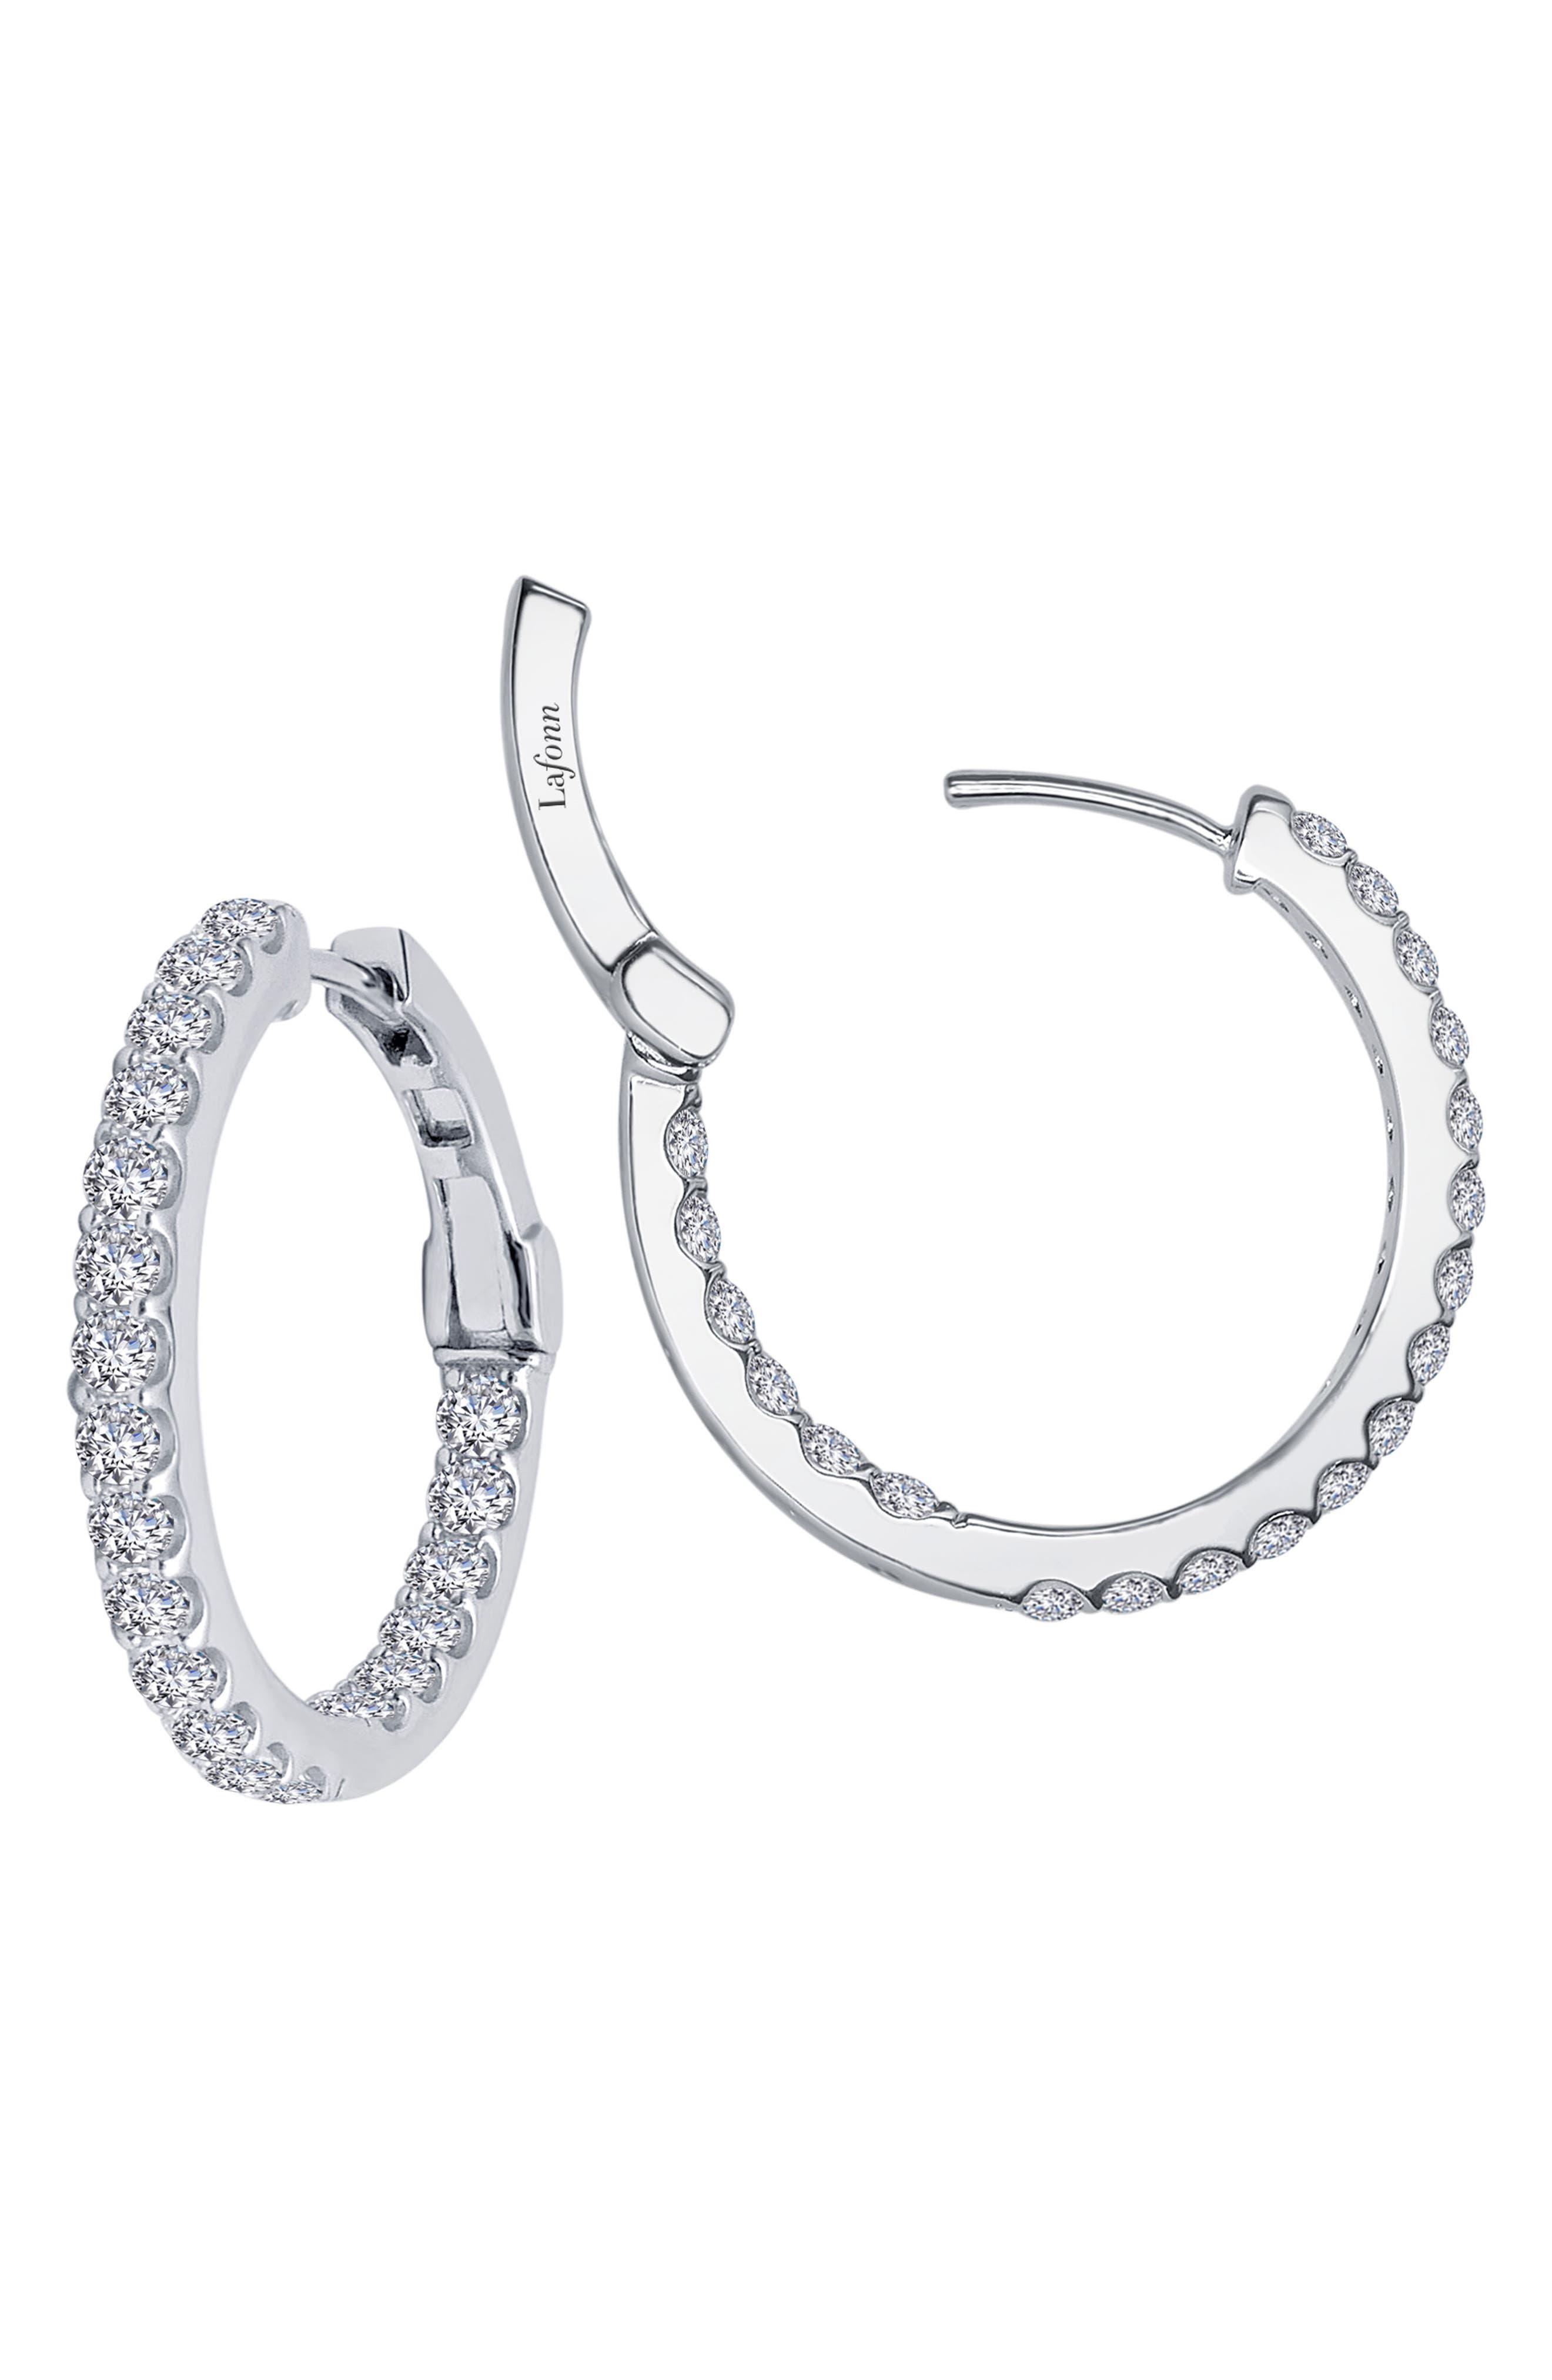 Inside Out Simulated Diamond Hoop Earrings